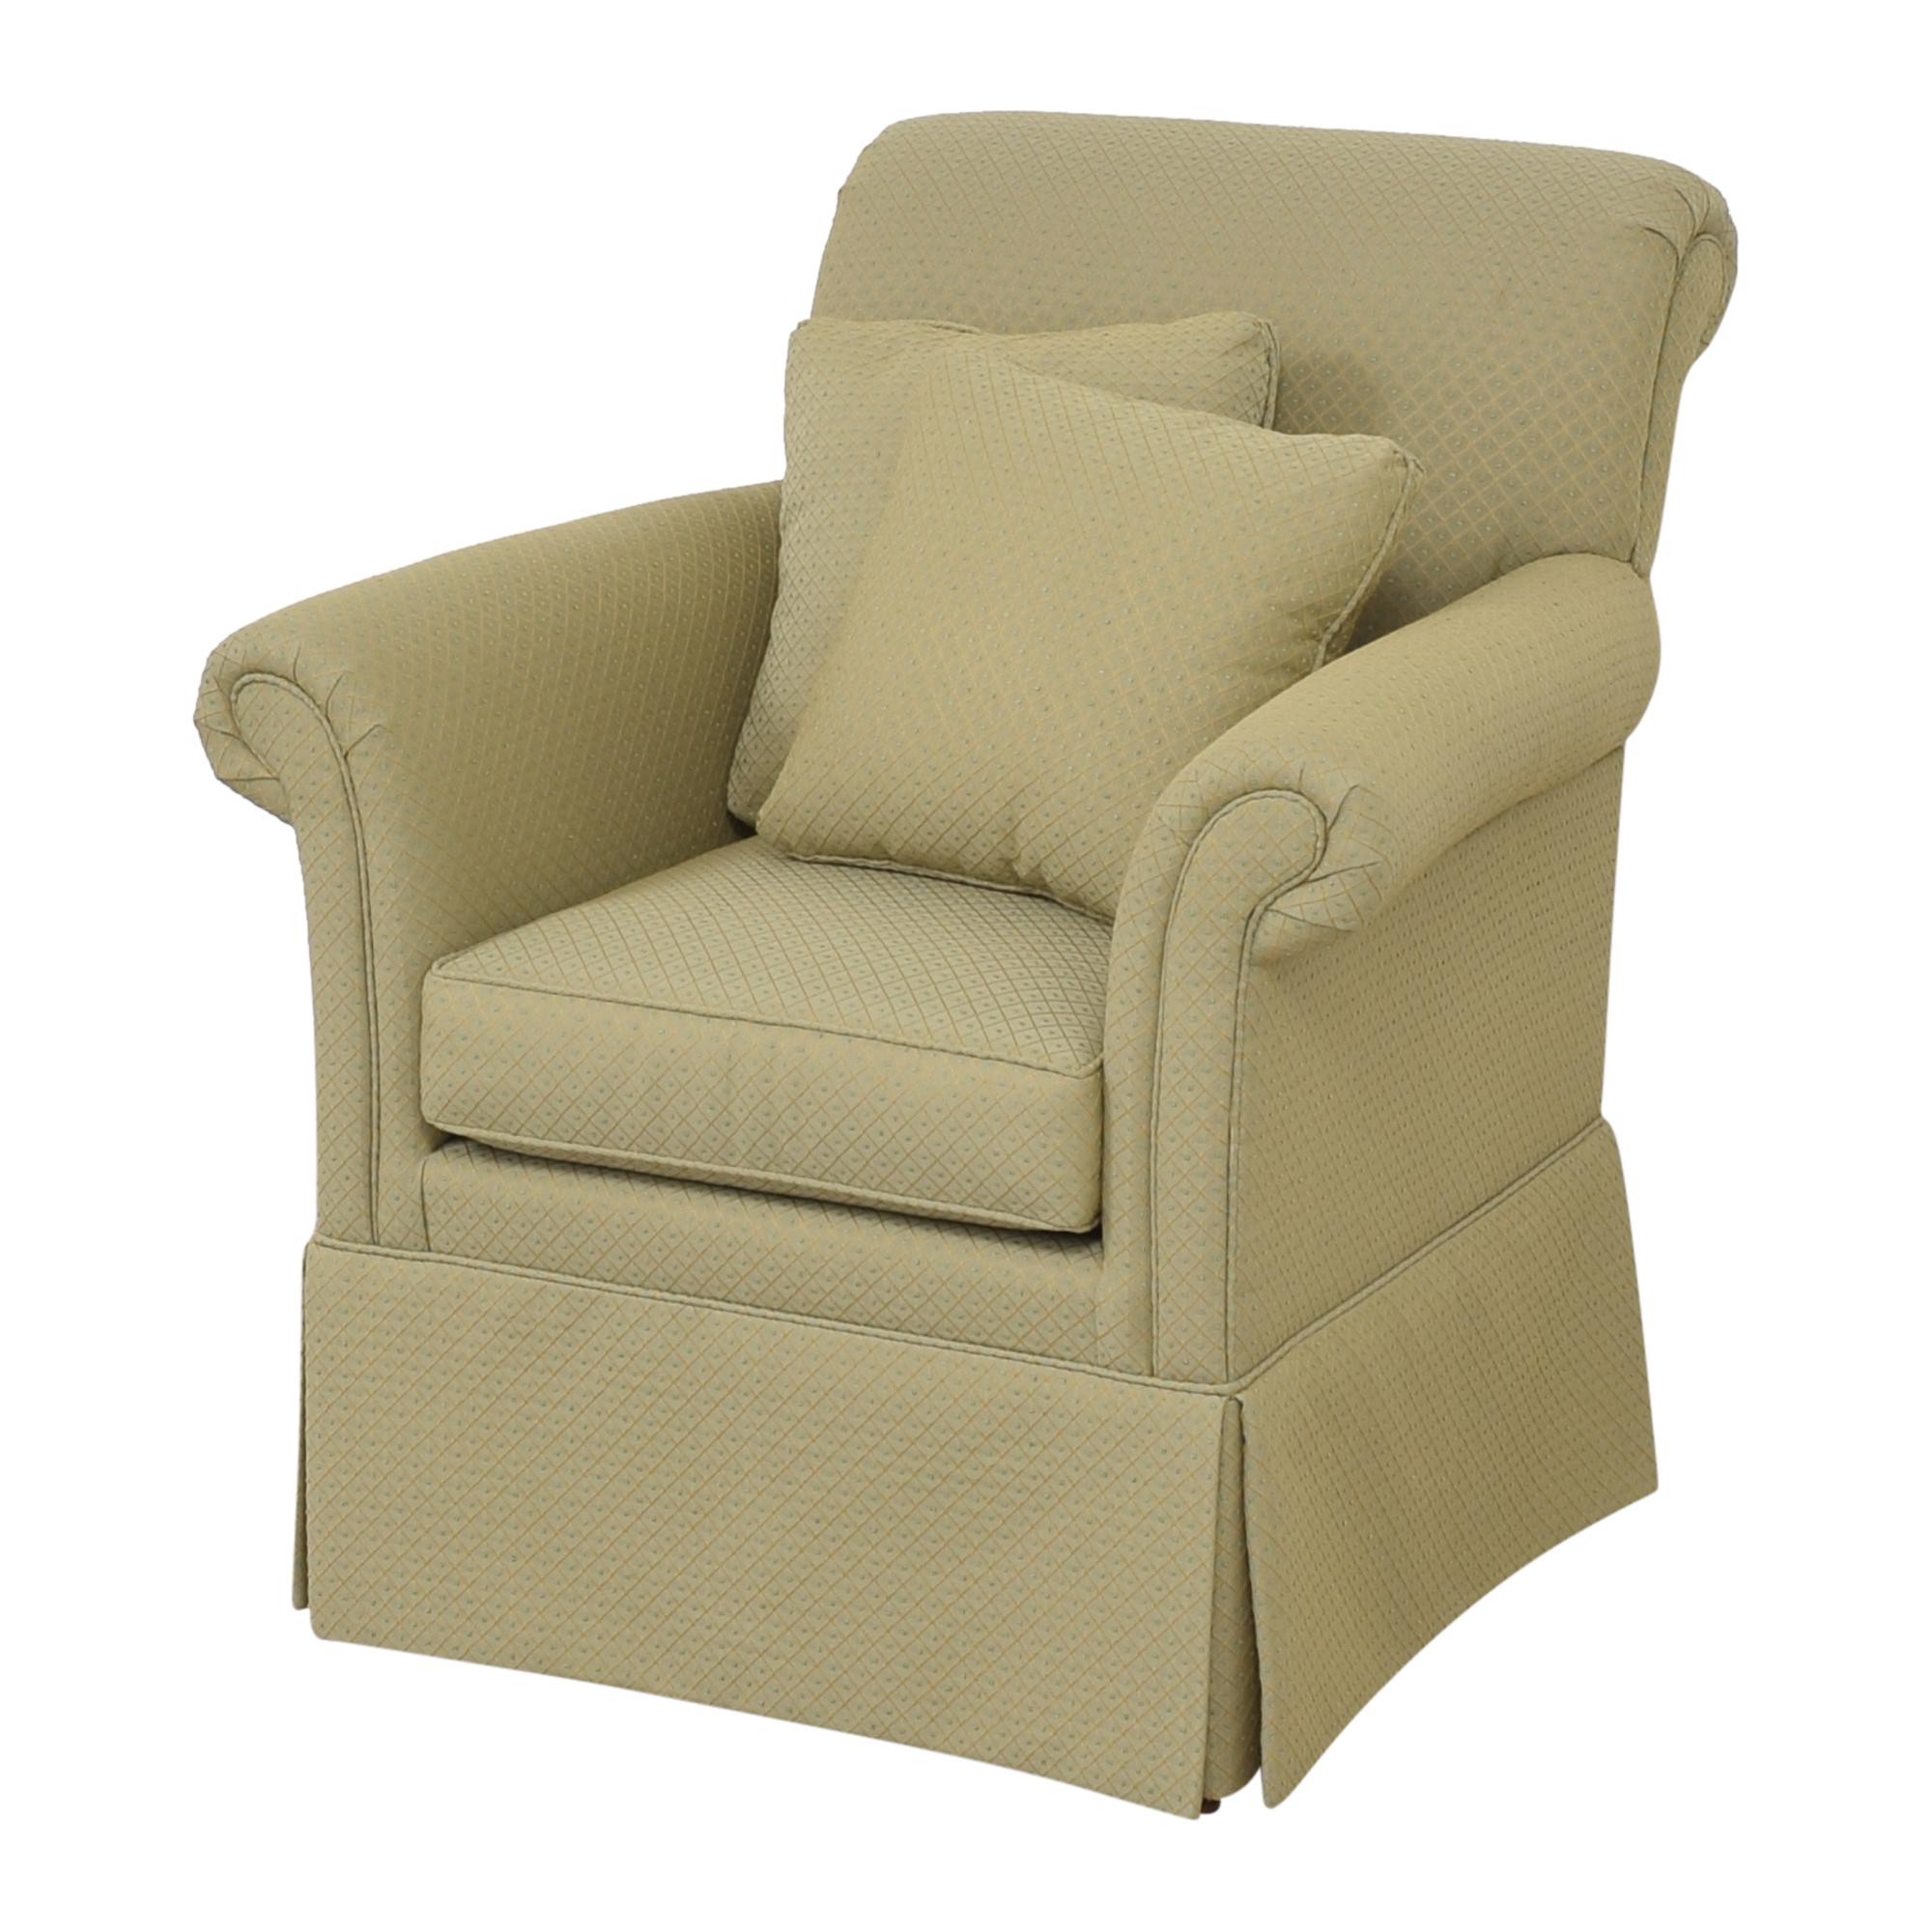 Ethan Allen Ethan Allen Skirted Accent Chair Chairs